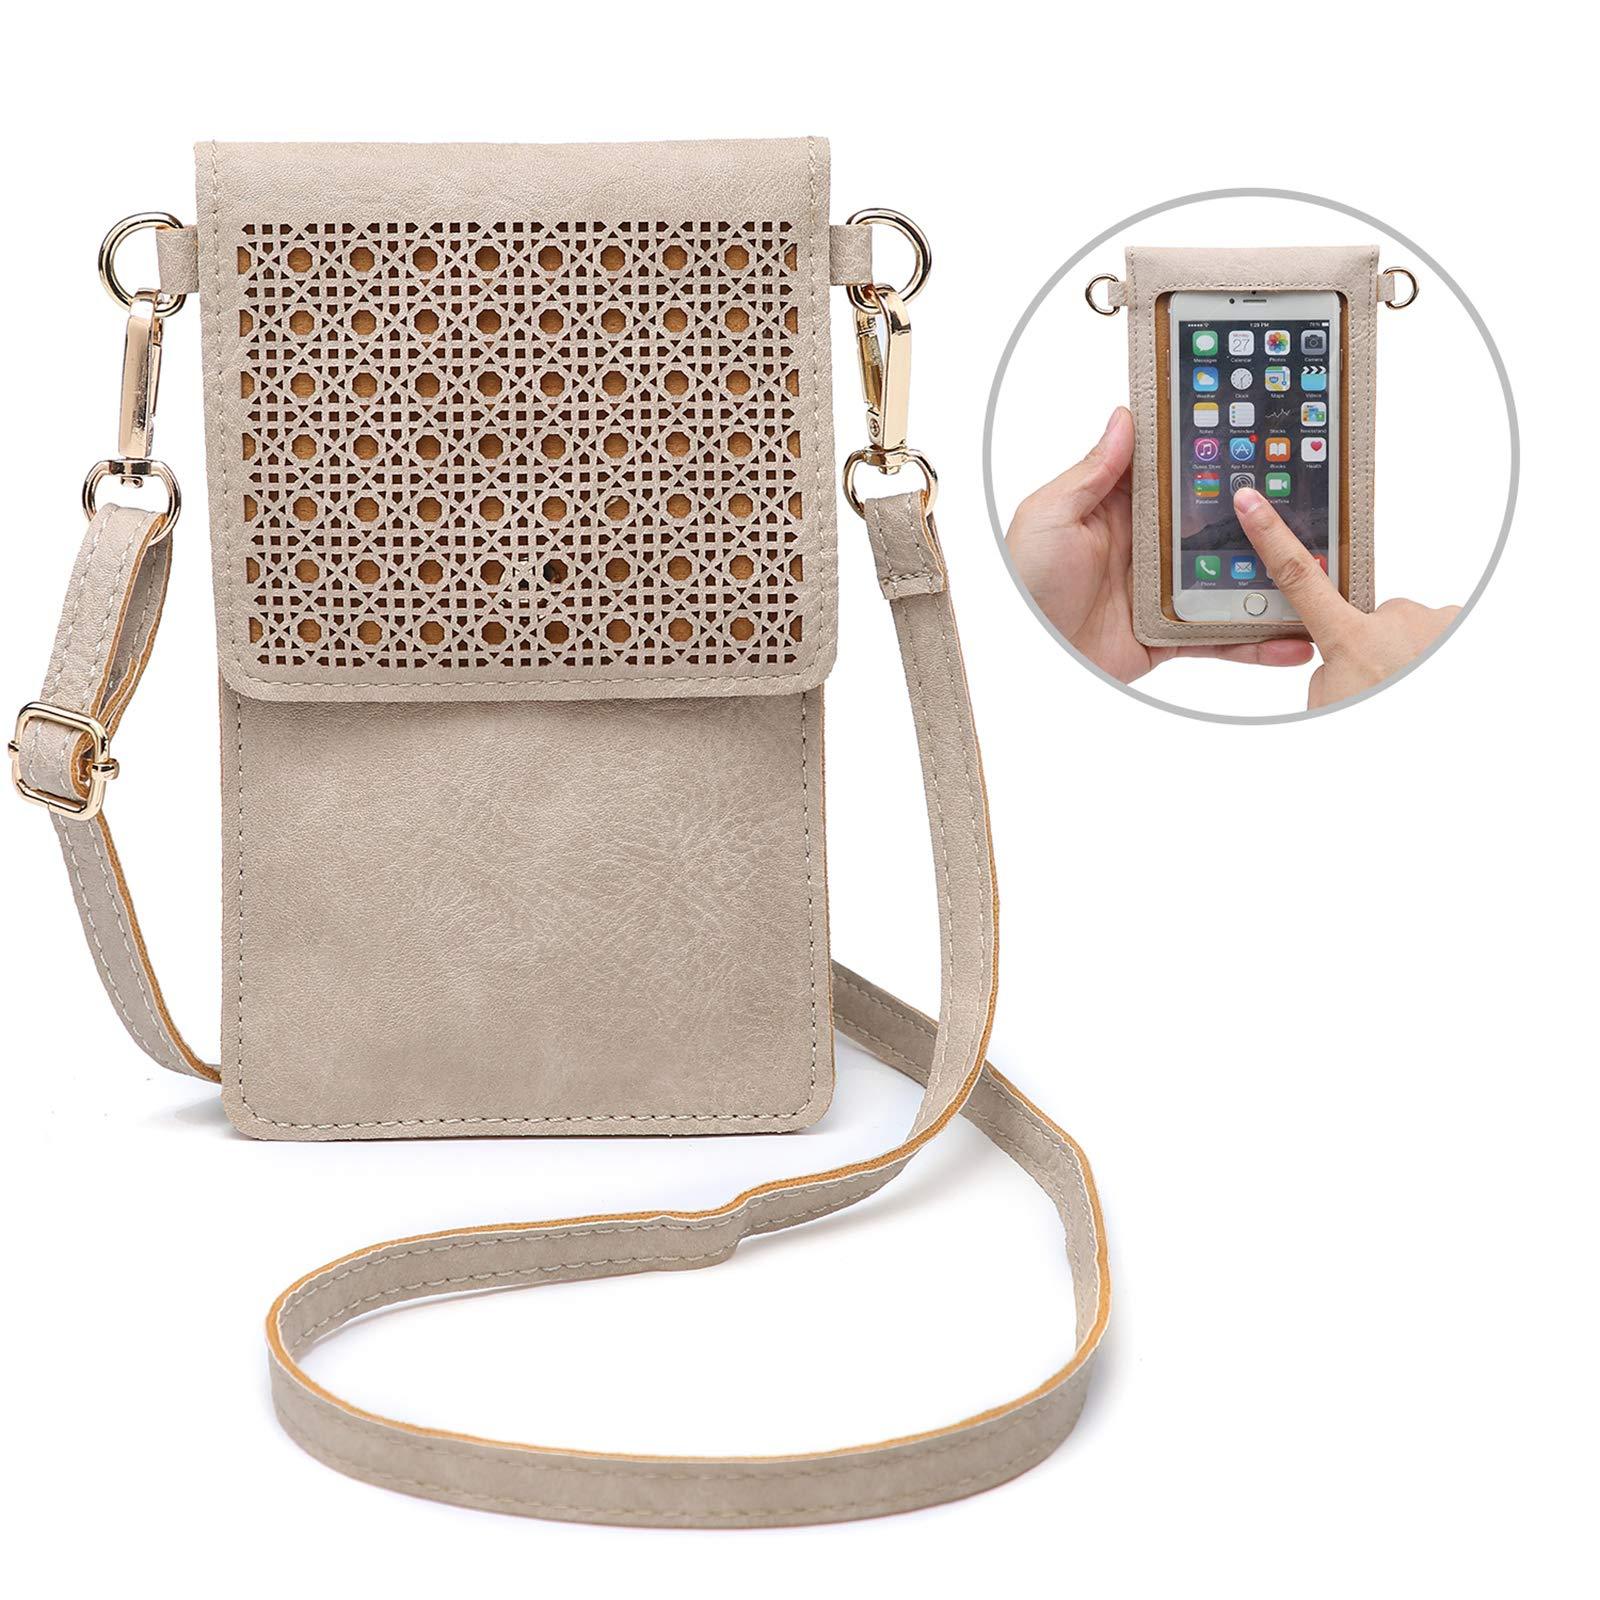 seOSTO Small Crossbody Bag Cell Phone Purse Wallet with 2 Shoulder Strap Handbag for Women Girls (Beige) …